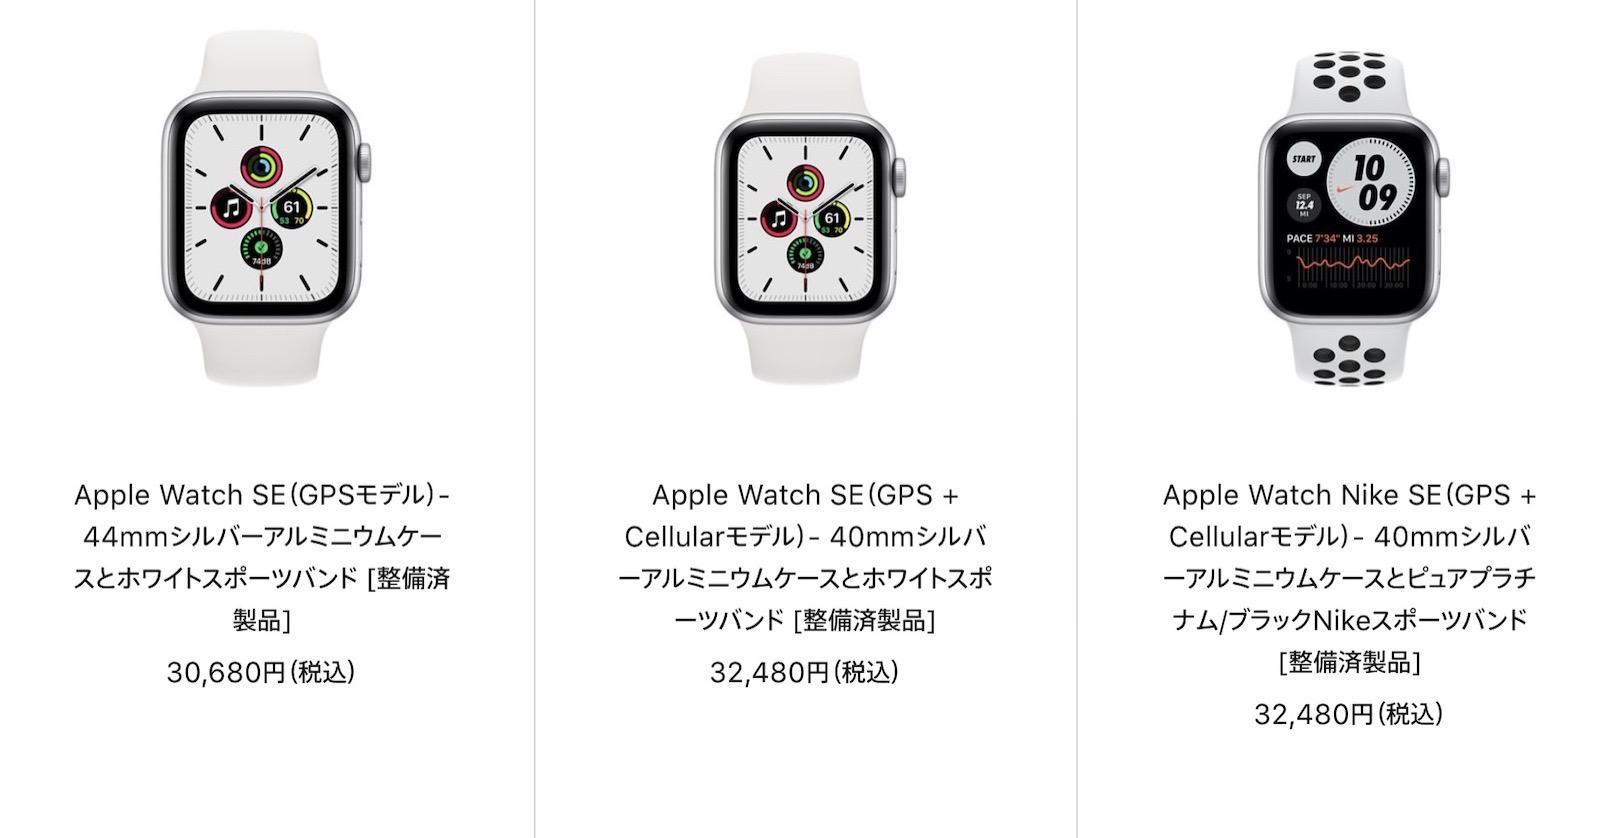 AppleWatch-Refurbished-model-2021-07-26.jpg